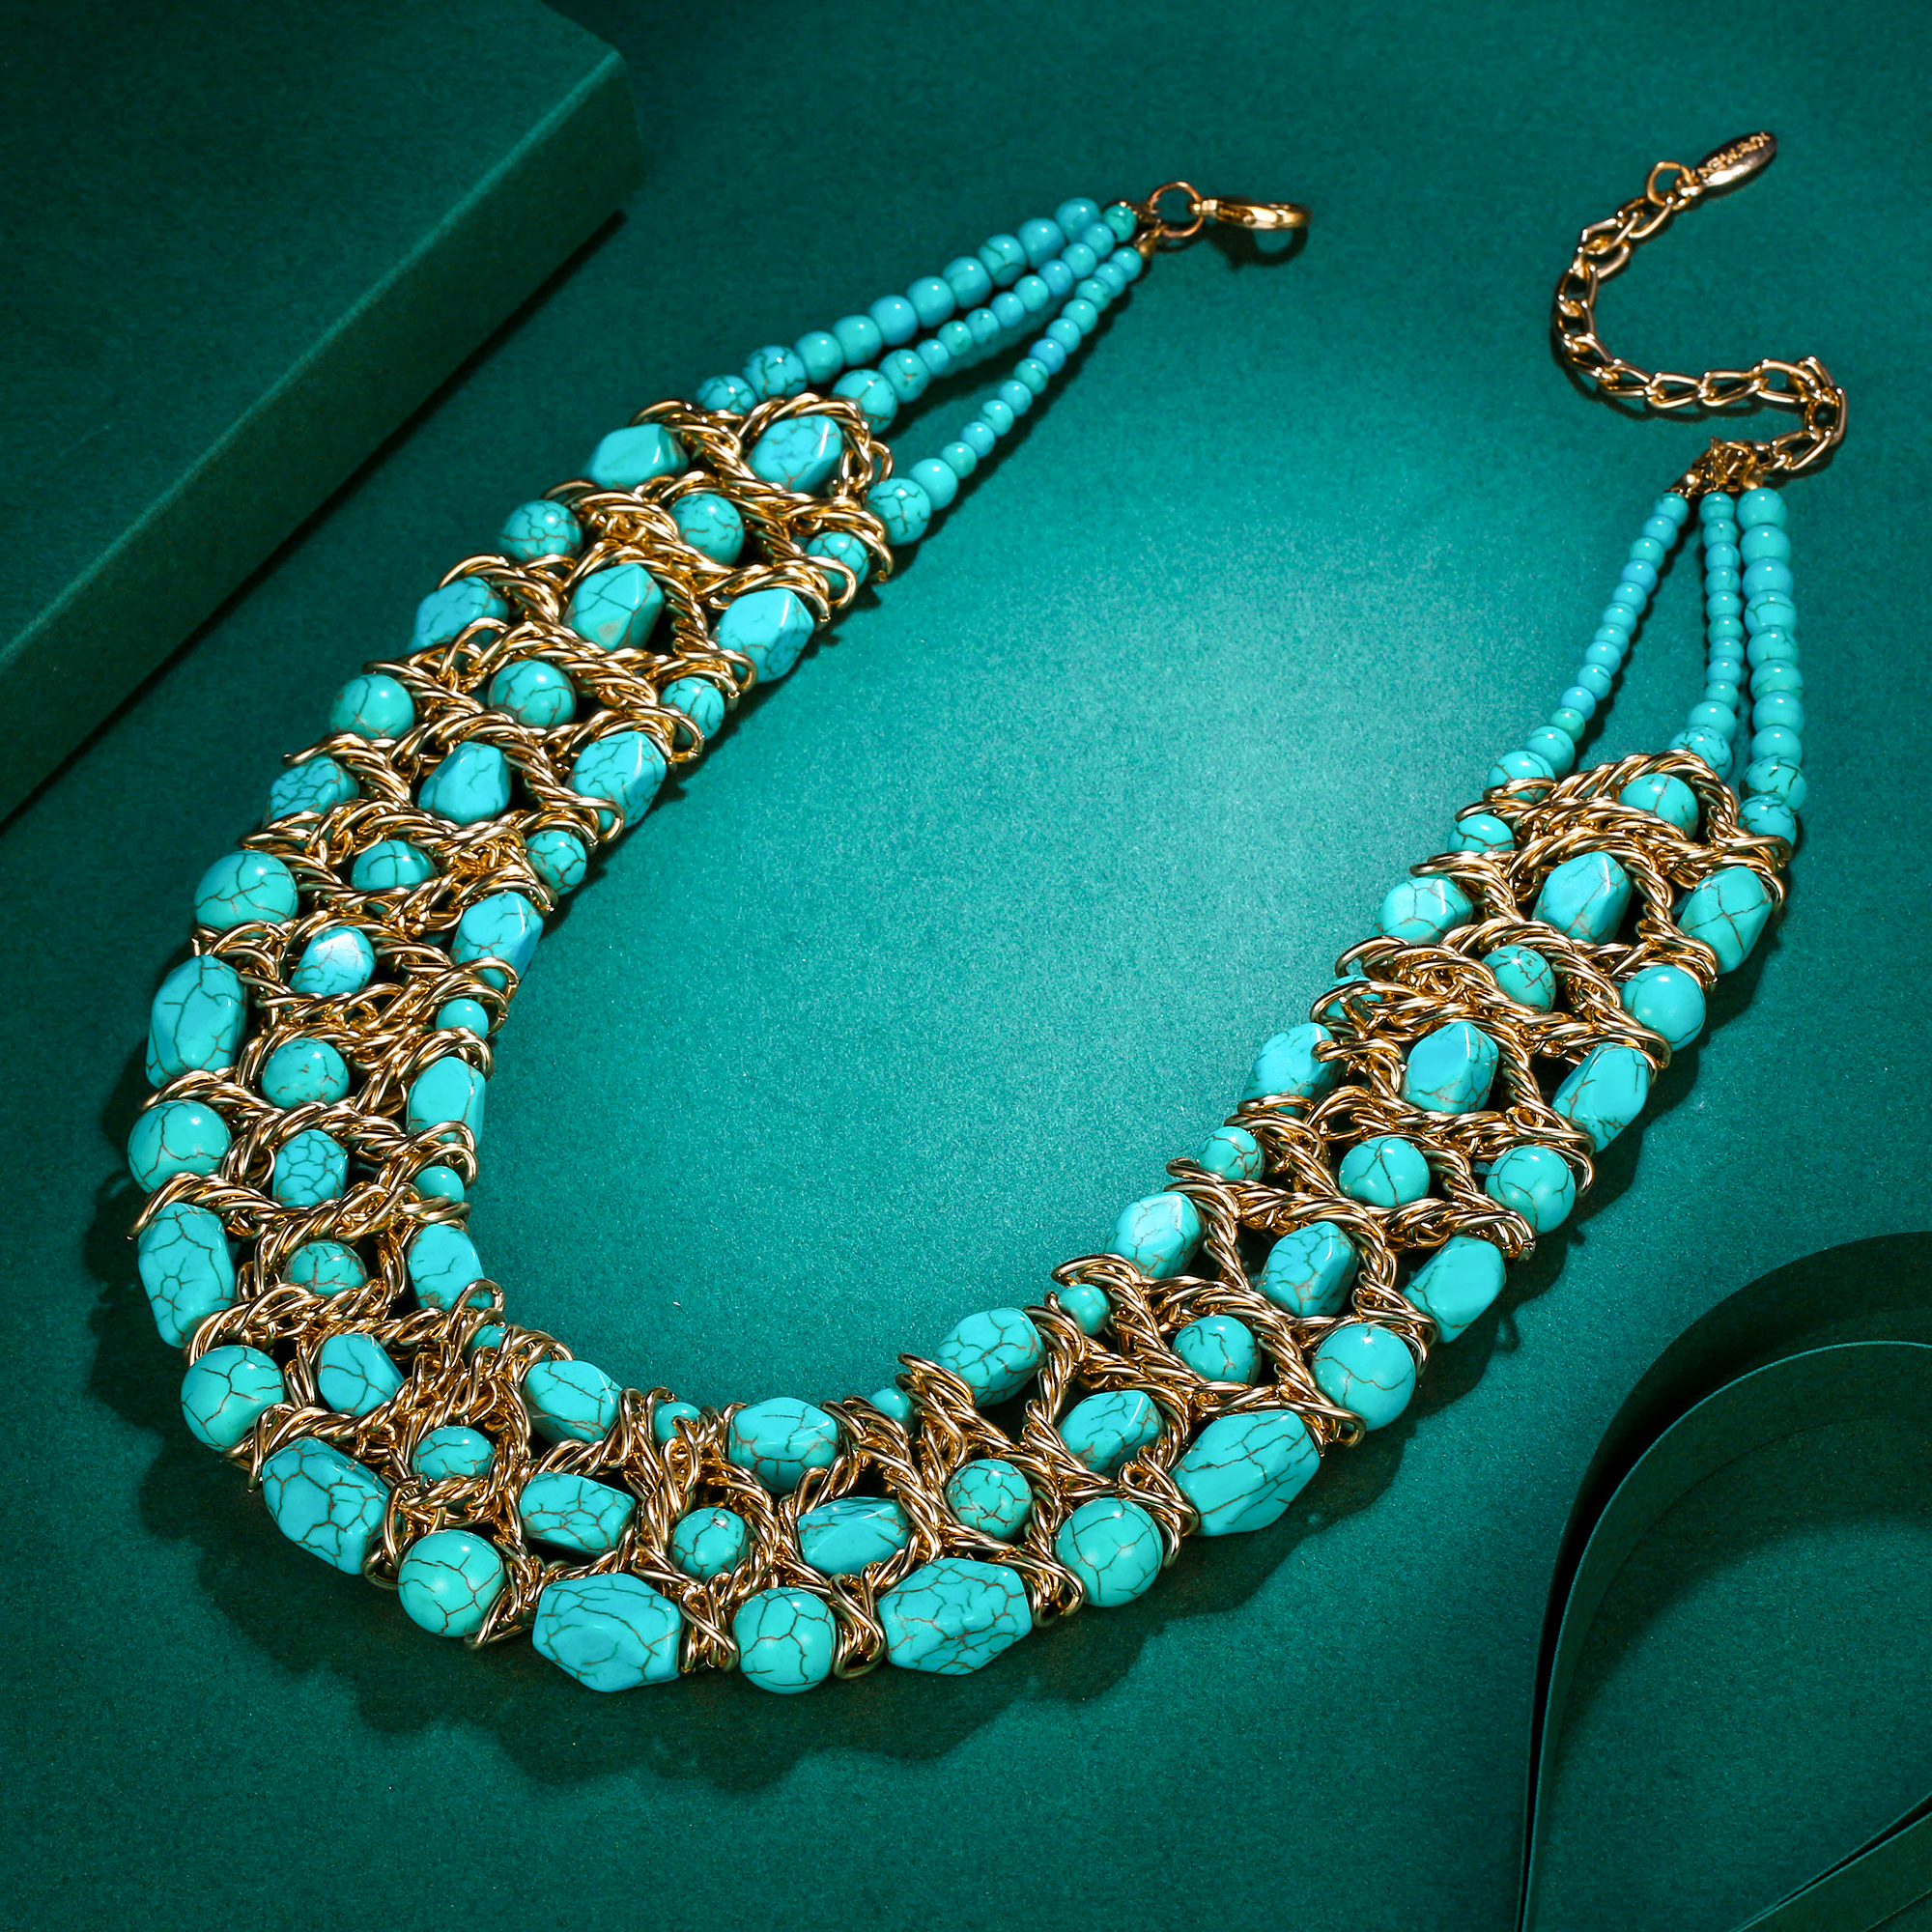 Collier Noel Tuliper Women Statement Necklace Turkish Collier Noel Choker